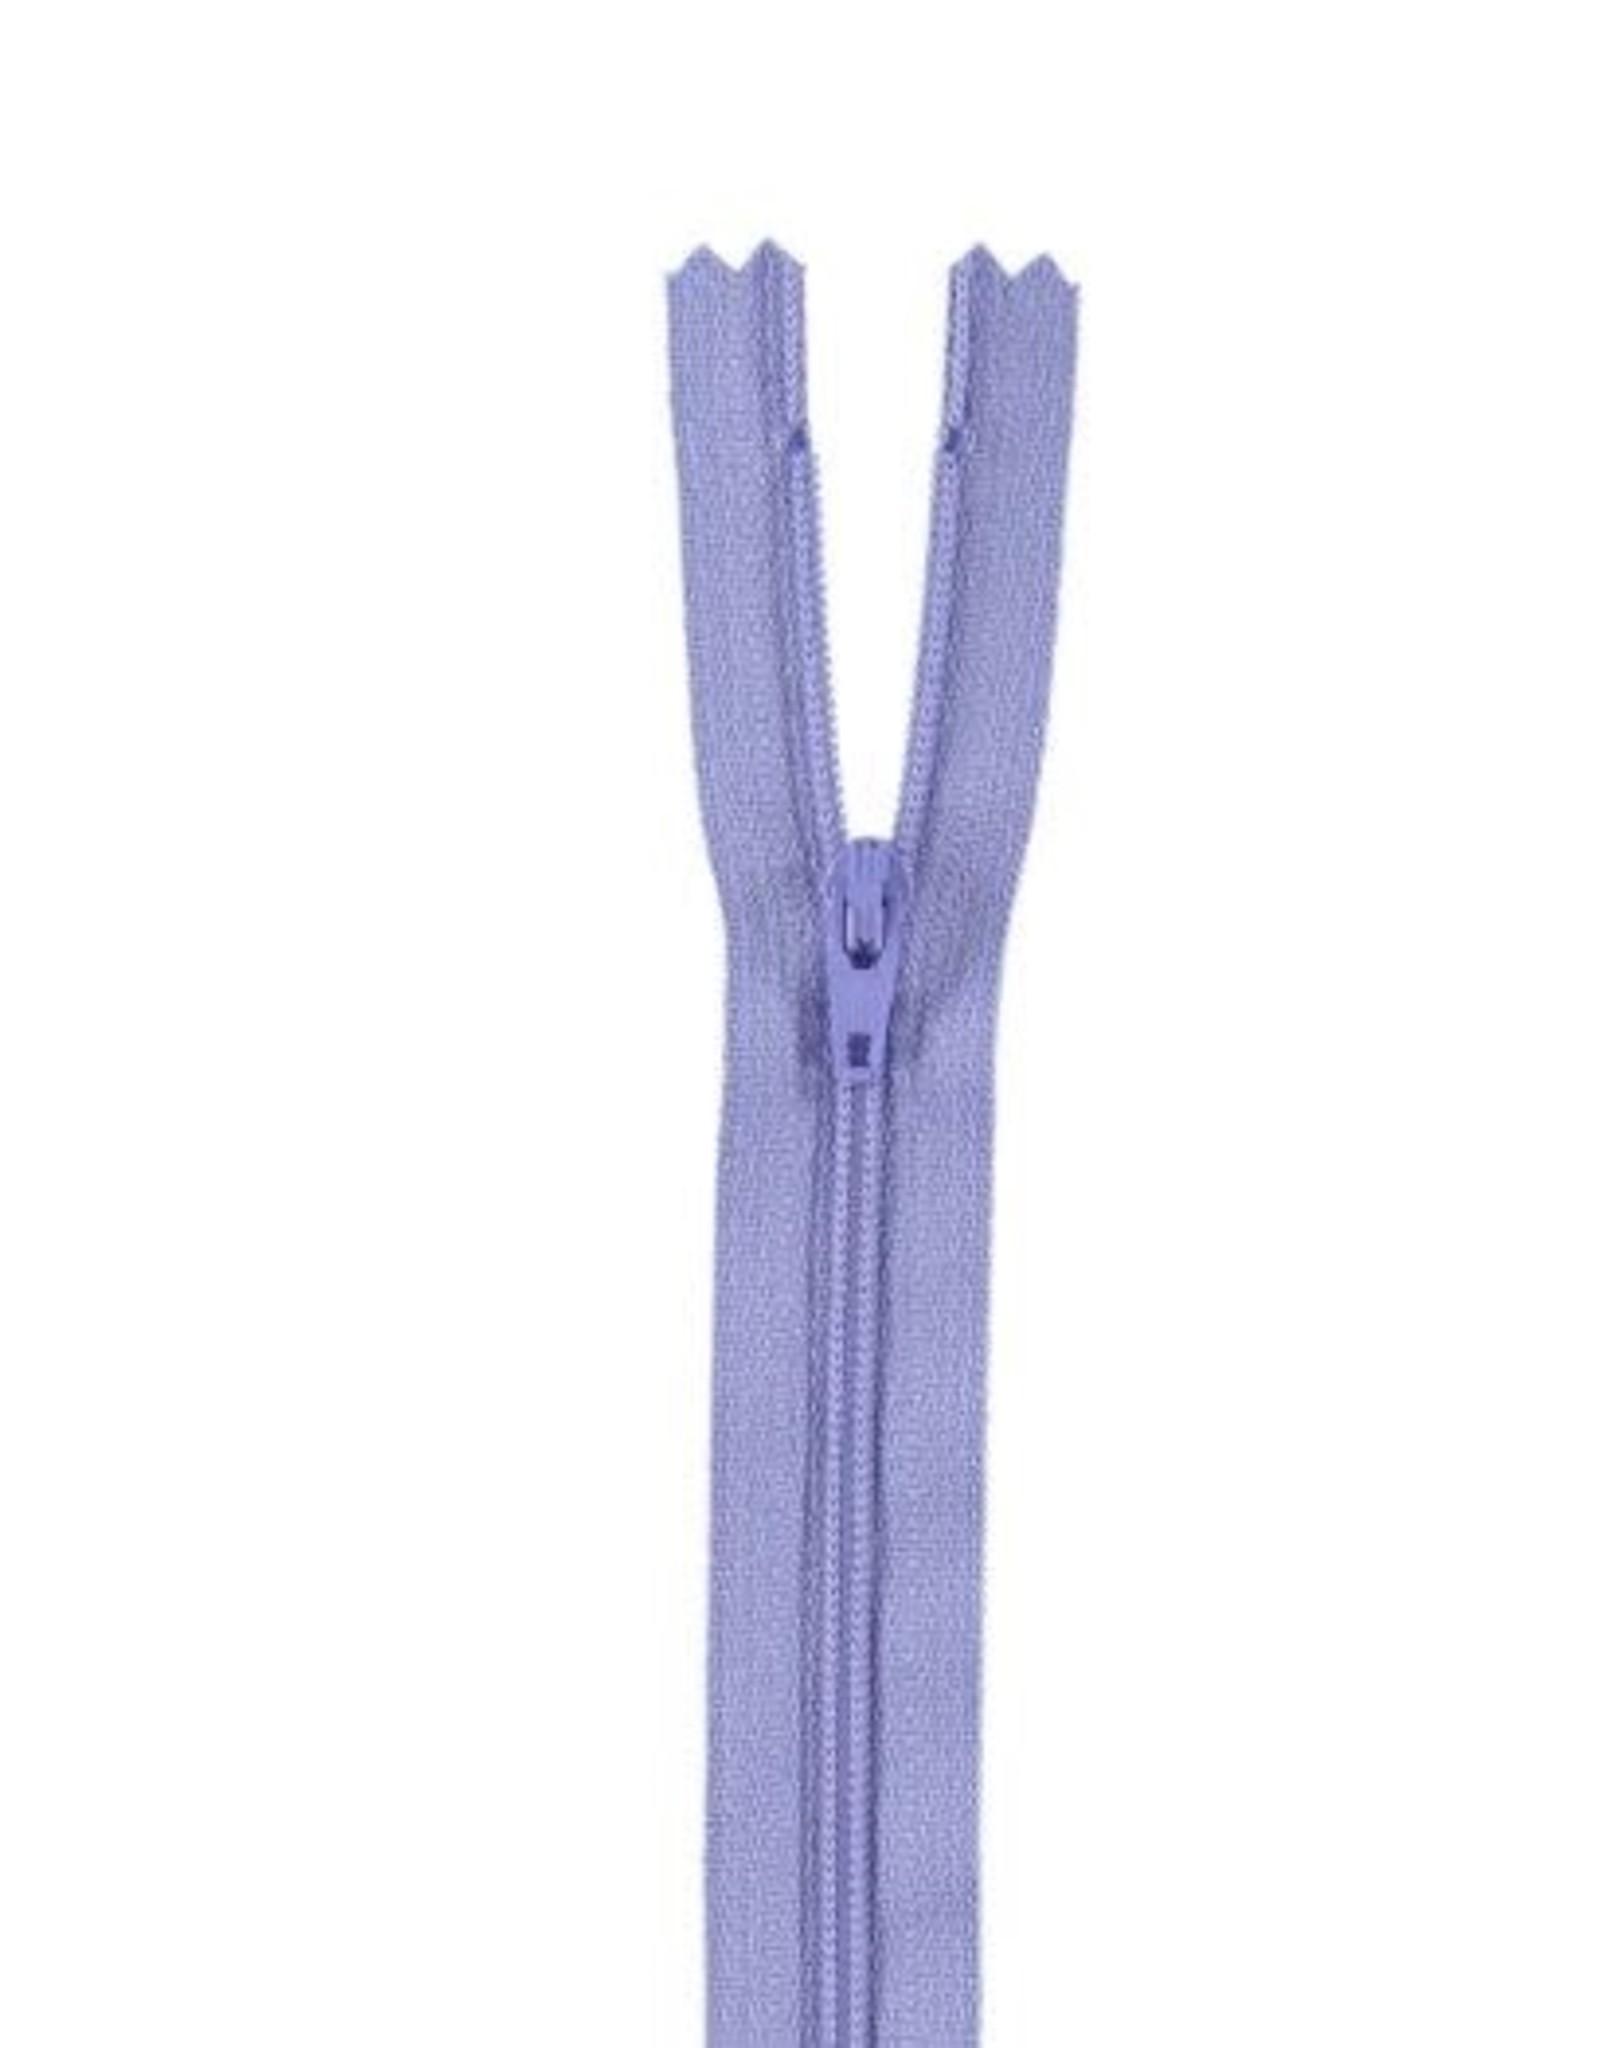 YKK Spiraalrits niet-DB 3mm blauwlila 554-15cm